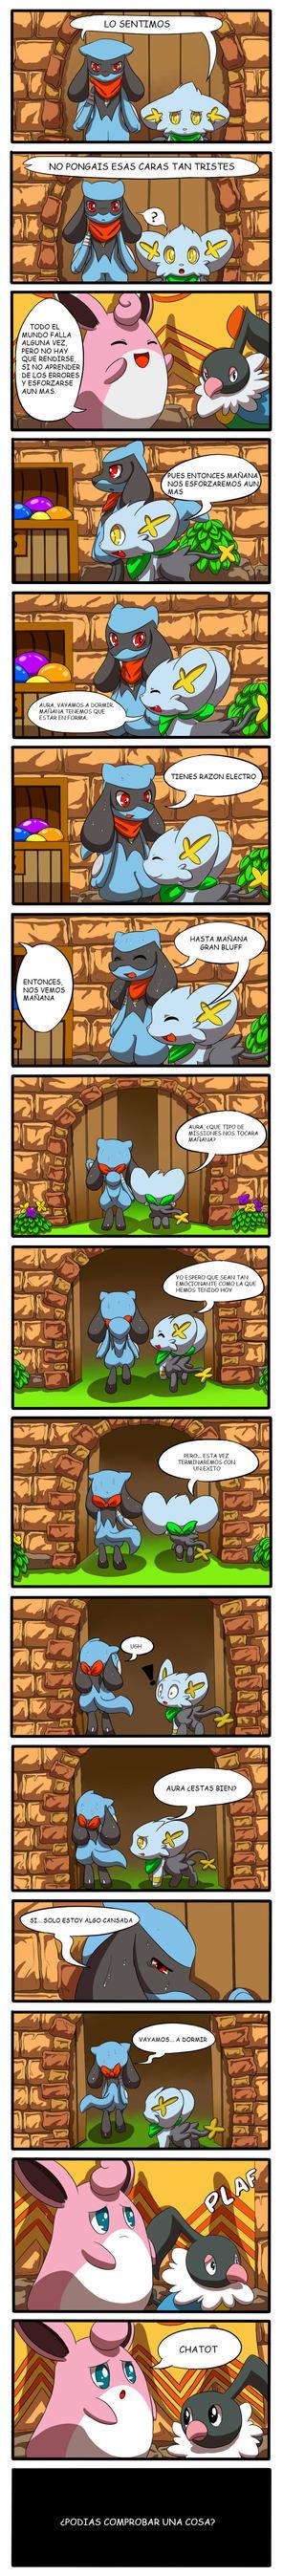 Pokemon Mystery dungeon 1 by inufaiya